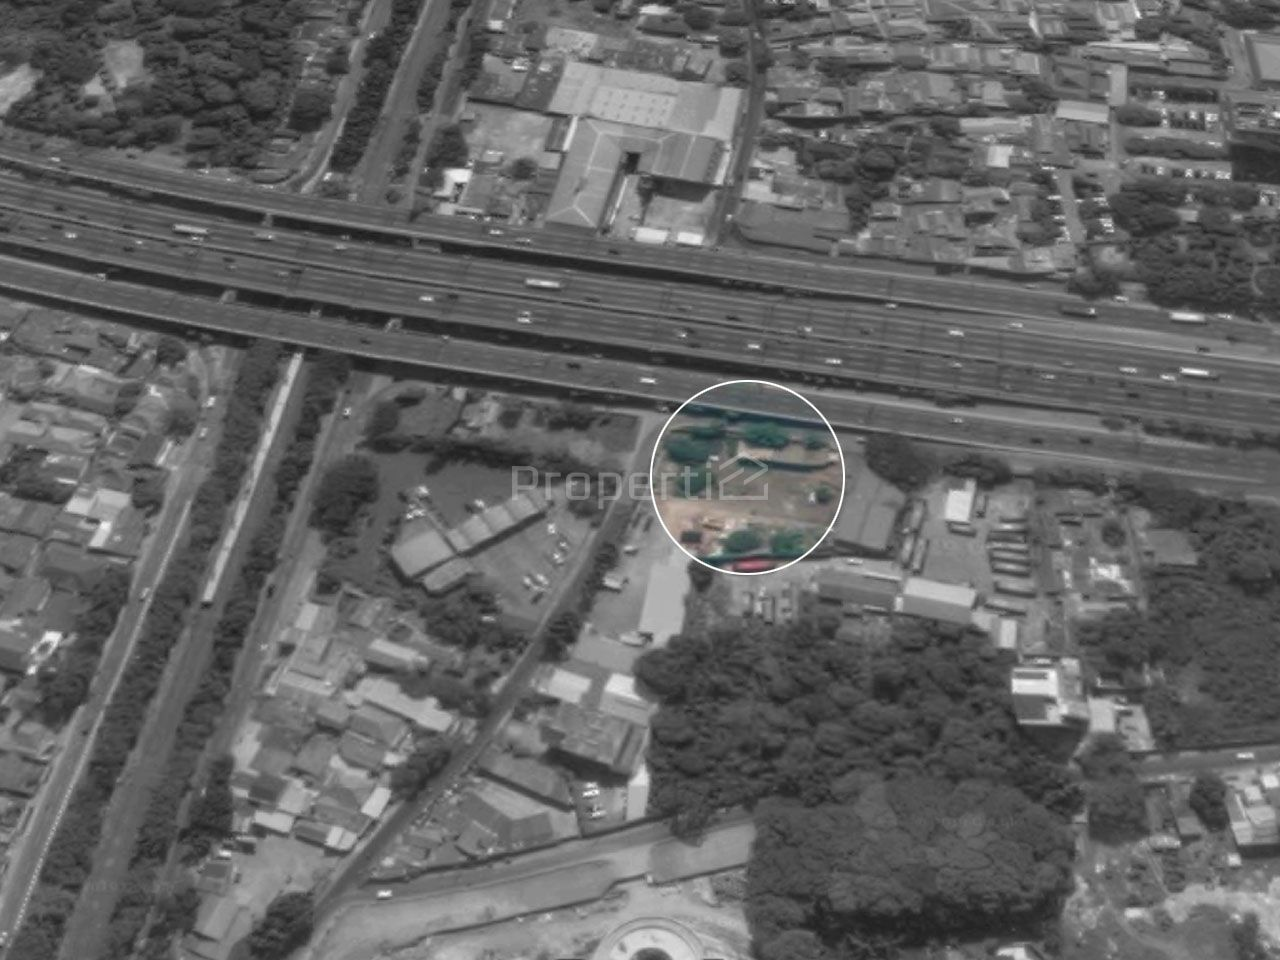 Commercial Land on Jalan TB Simatupang, DKI Jakarta